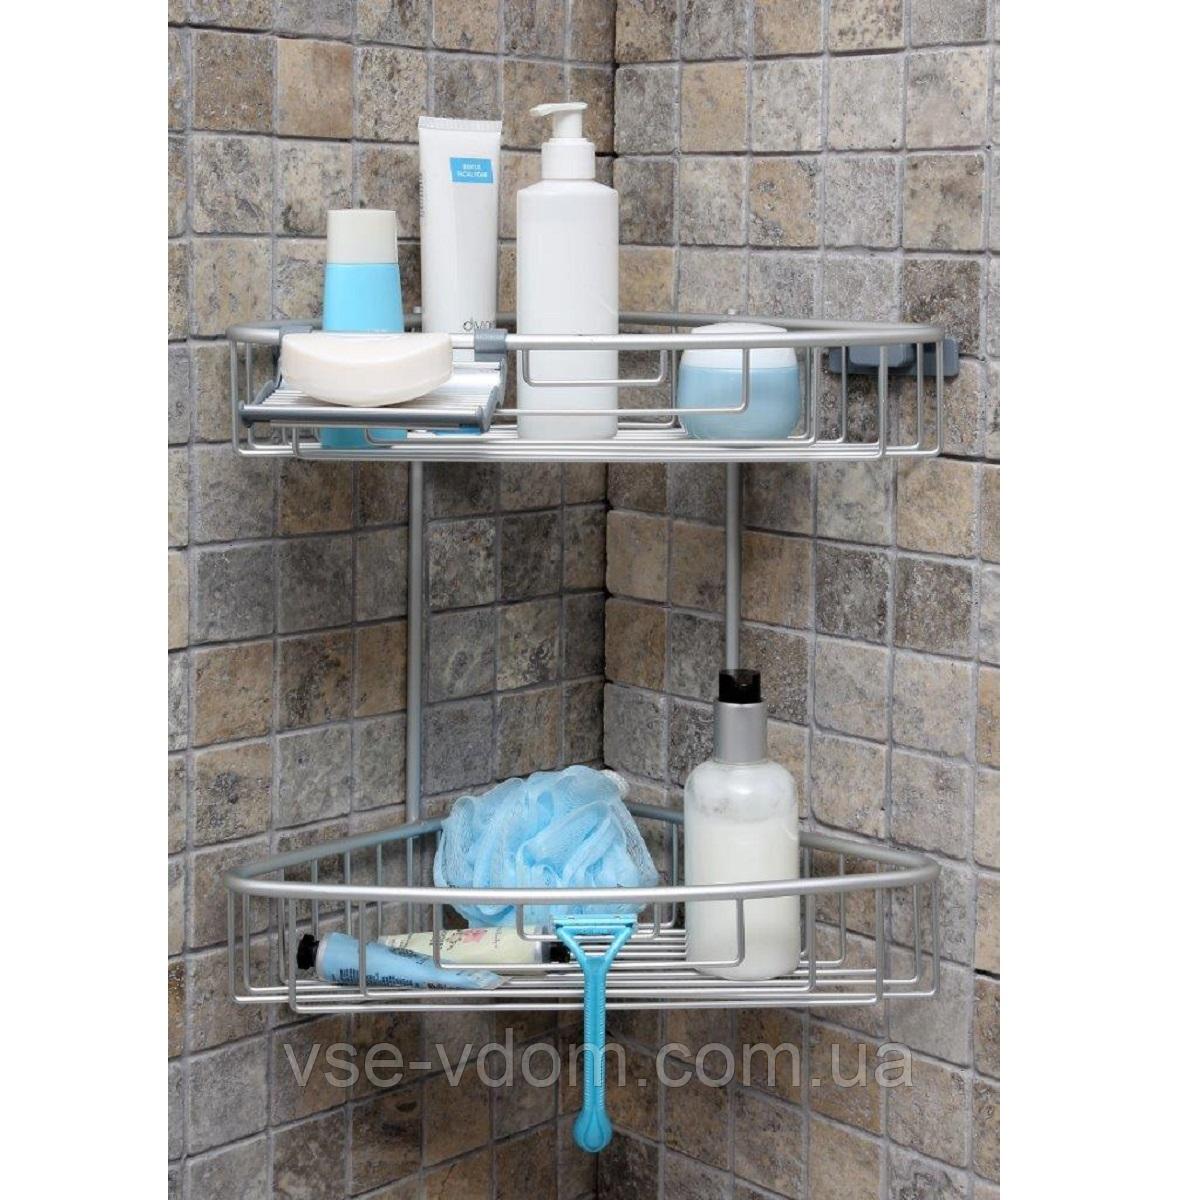 Полка для ванной двухъярусная алюминиевая